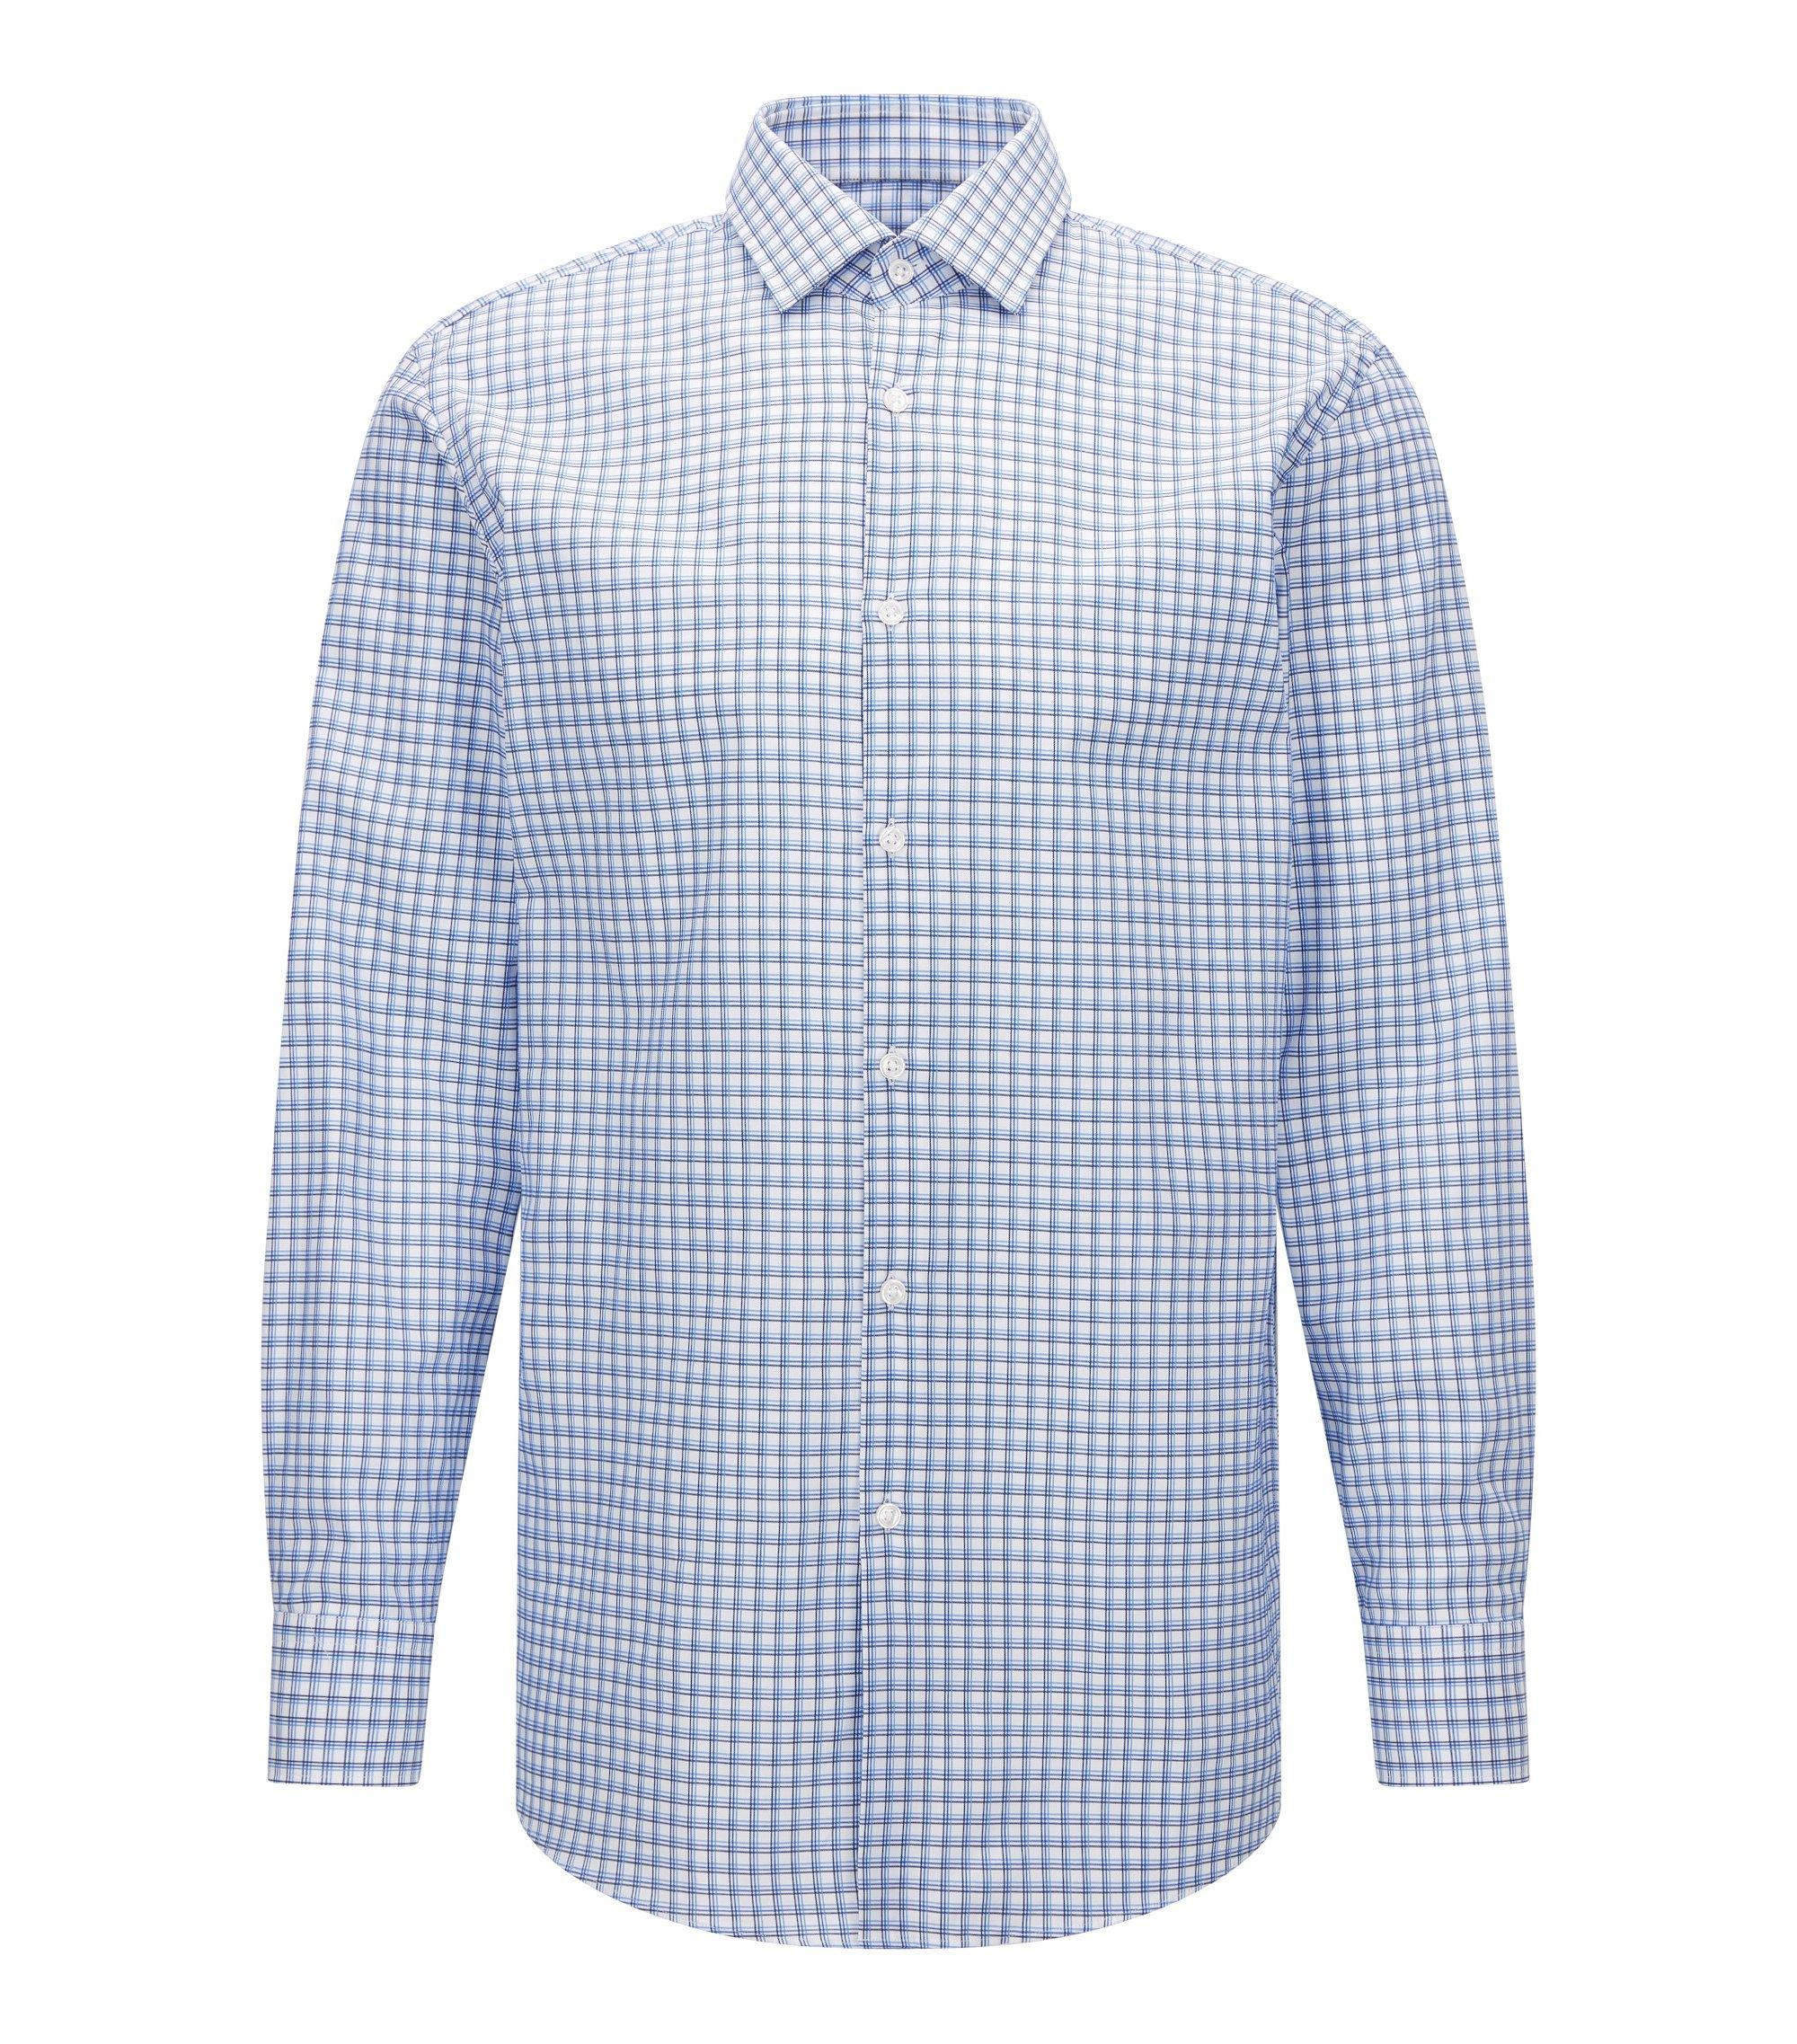 Tattersall Cotton Dress Shirt, Sharp Fit | Marley US, Blue